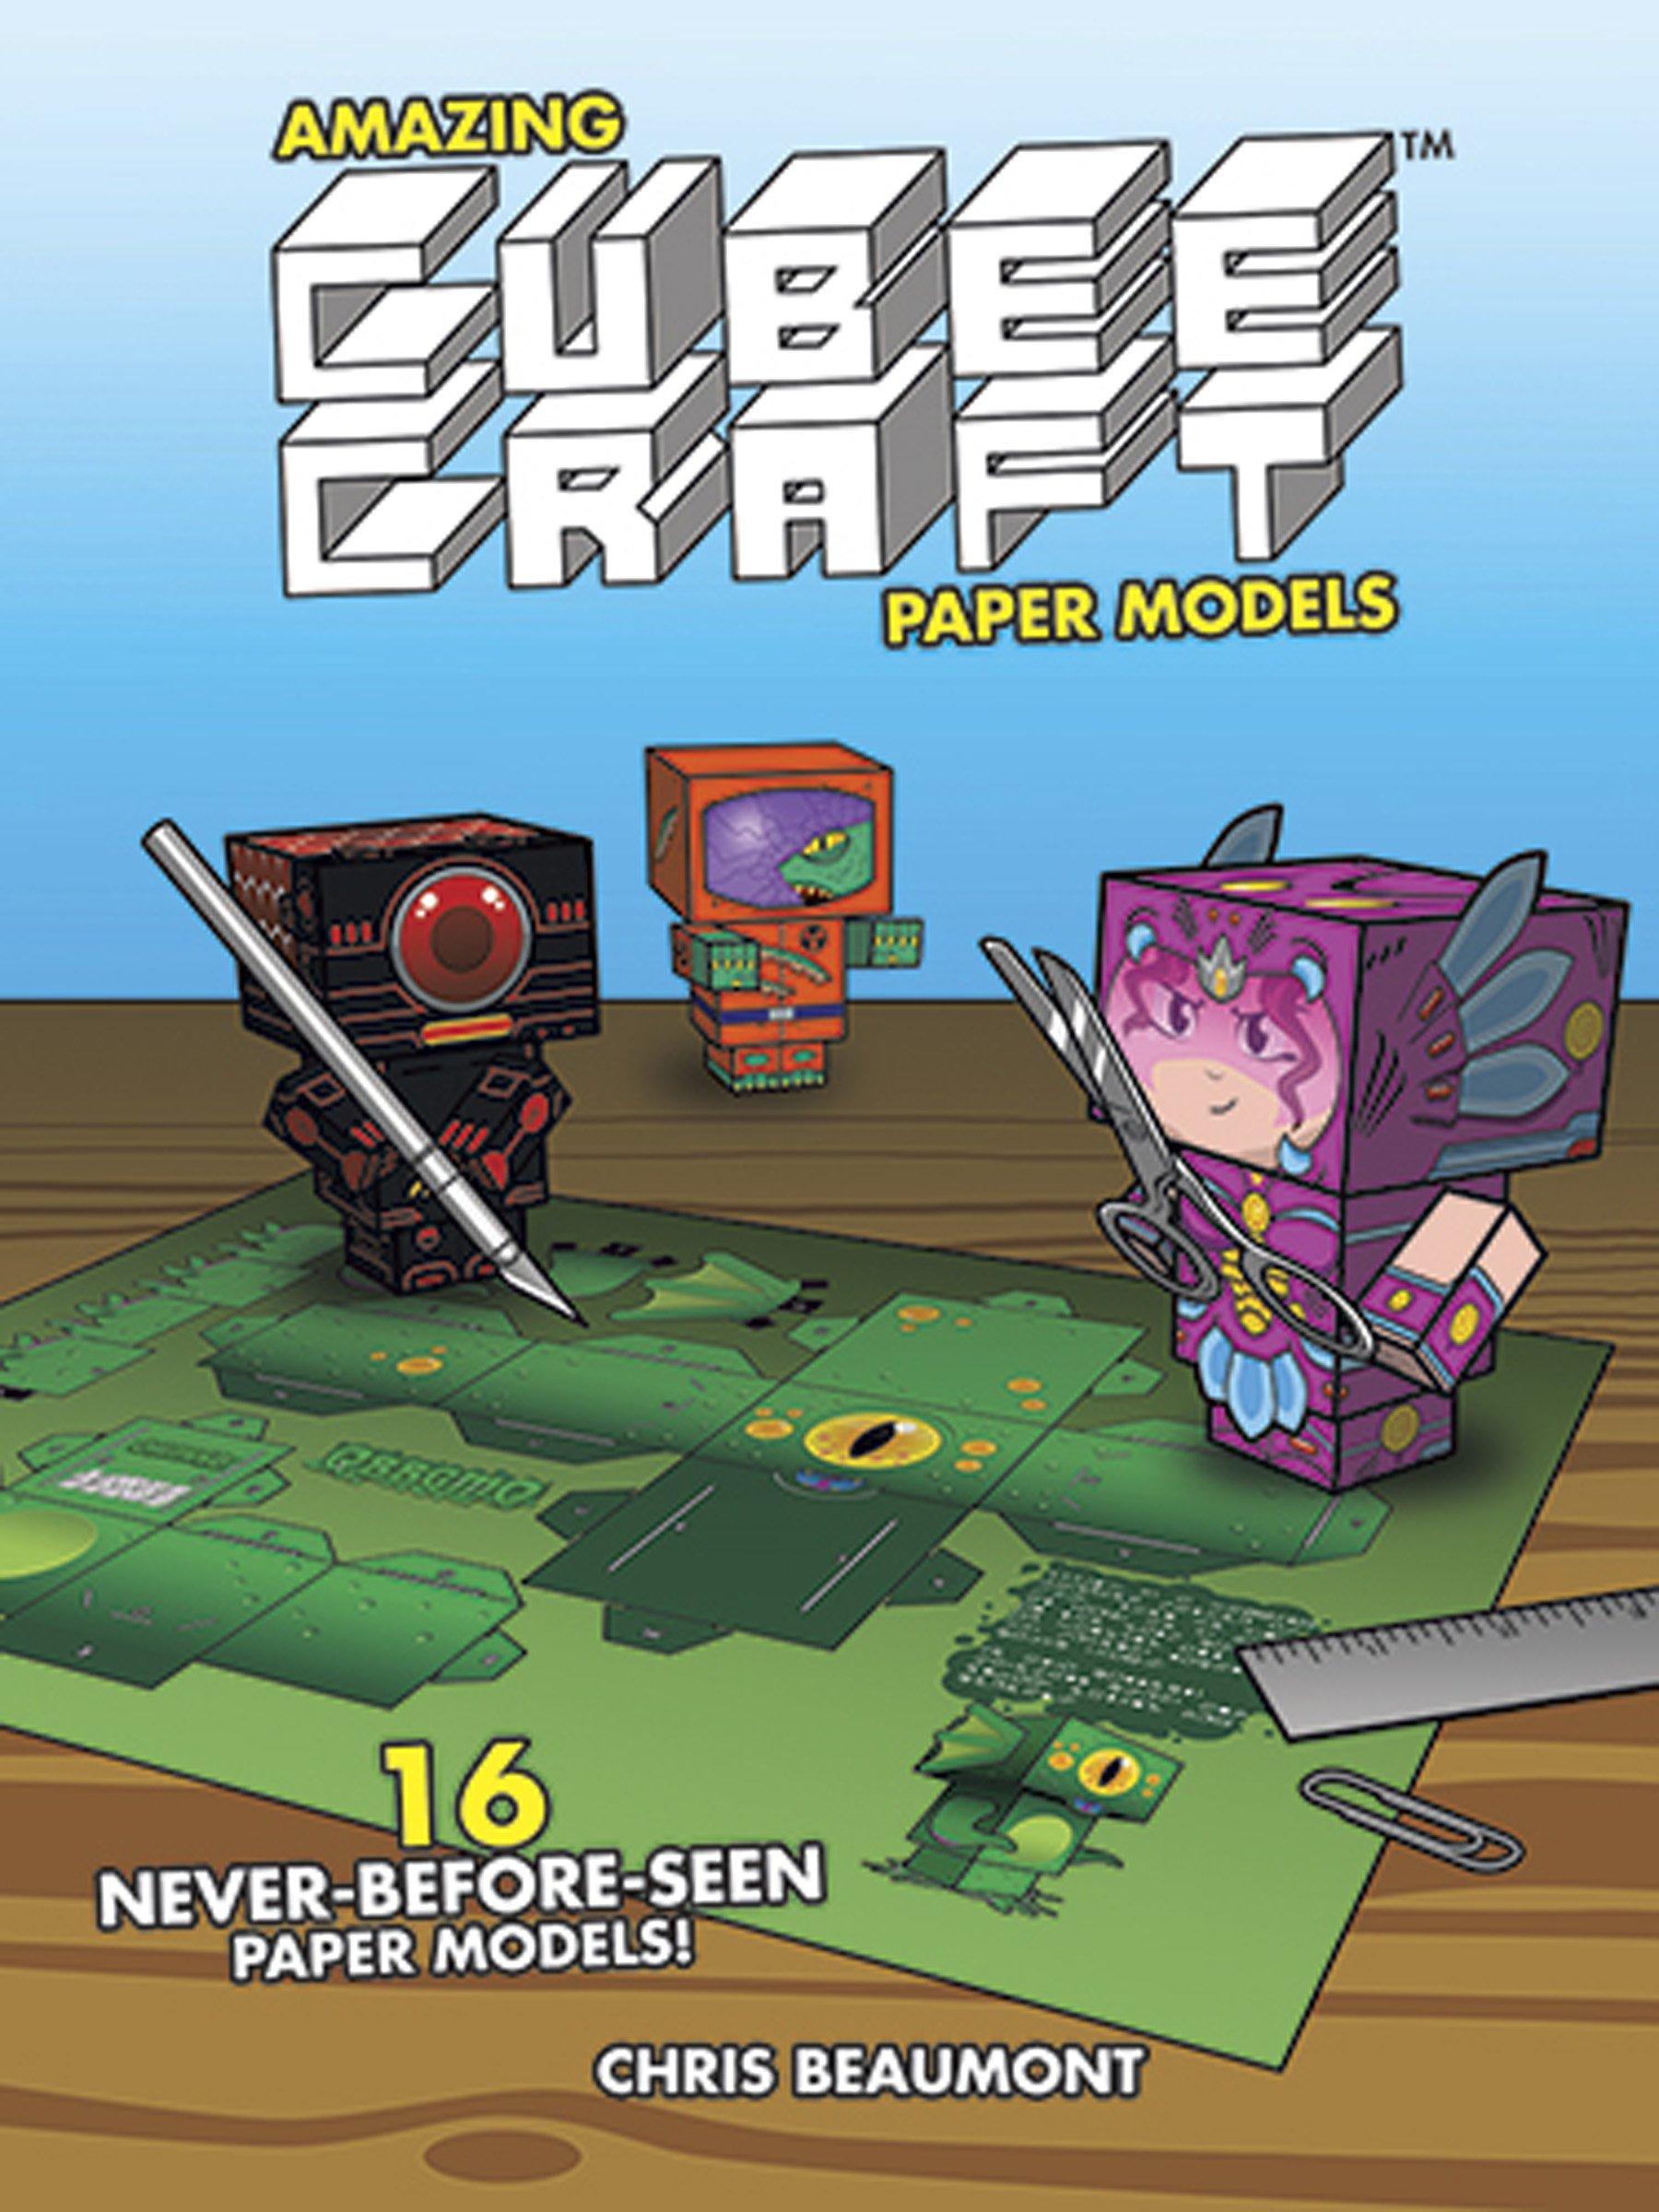 Amazing Cubeecraft Paper Models: 16 Never-Before-Seen Paper